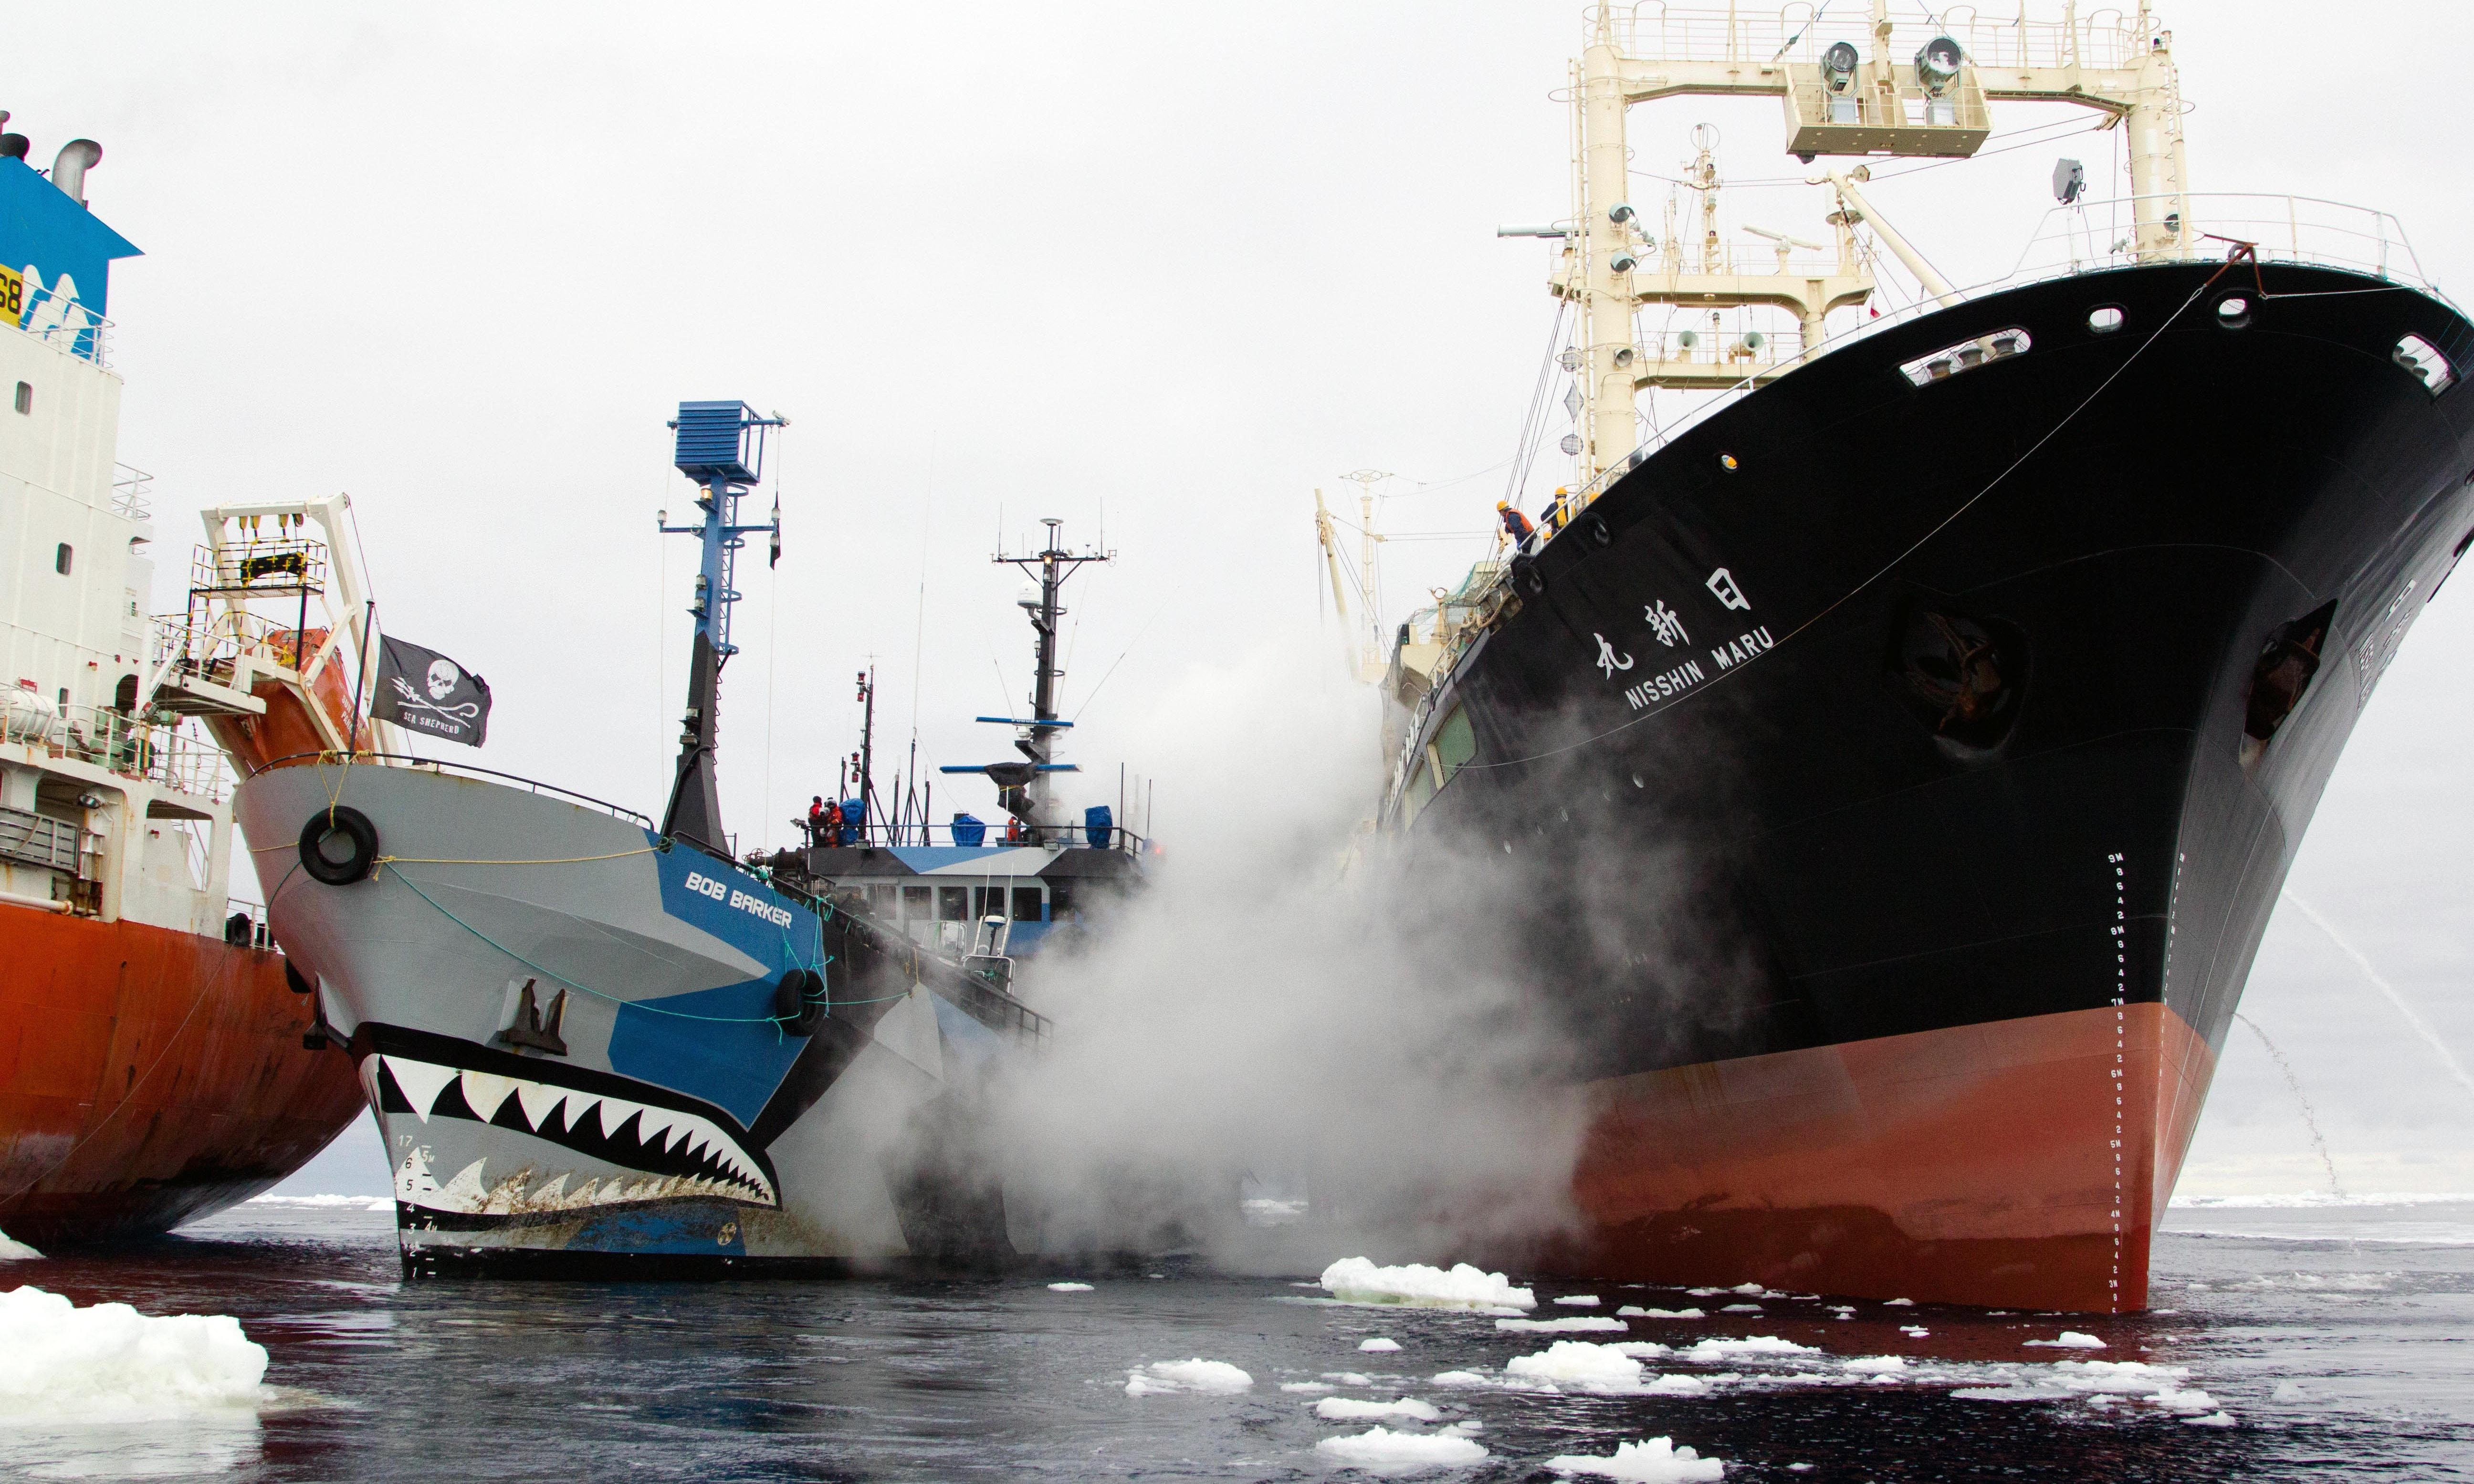 Sea Shepherd Captain Paul Watson: 'I call what we do aggressive non-violence'